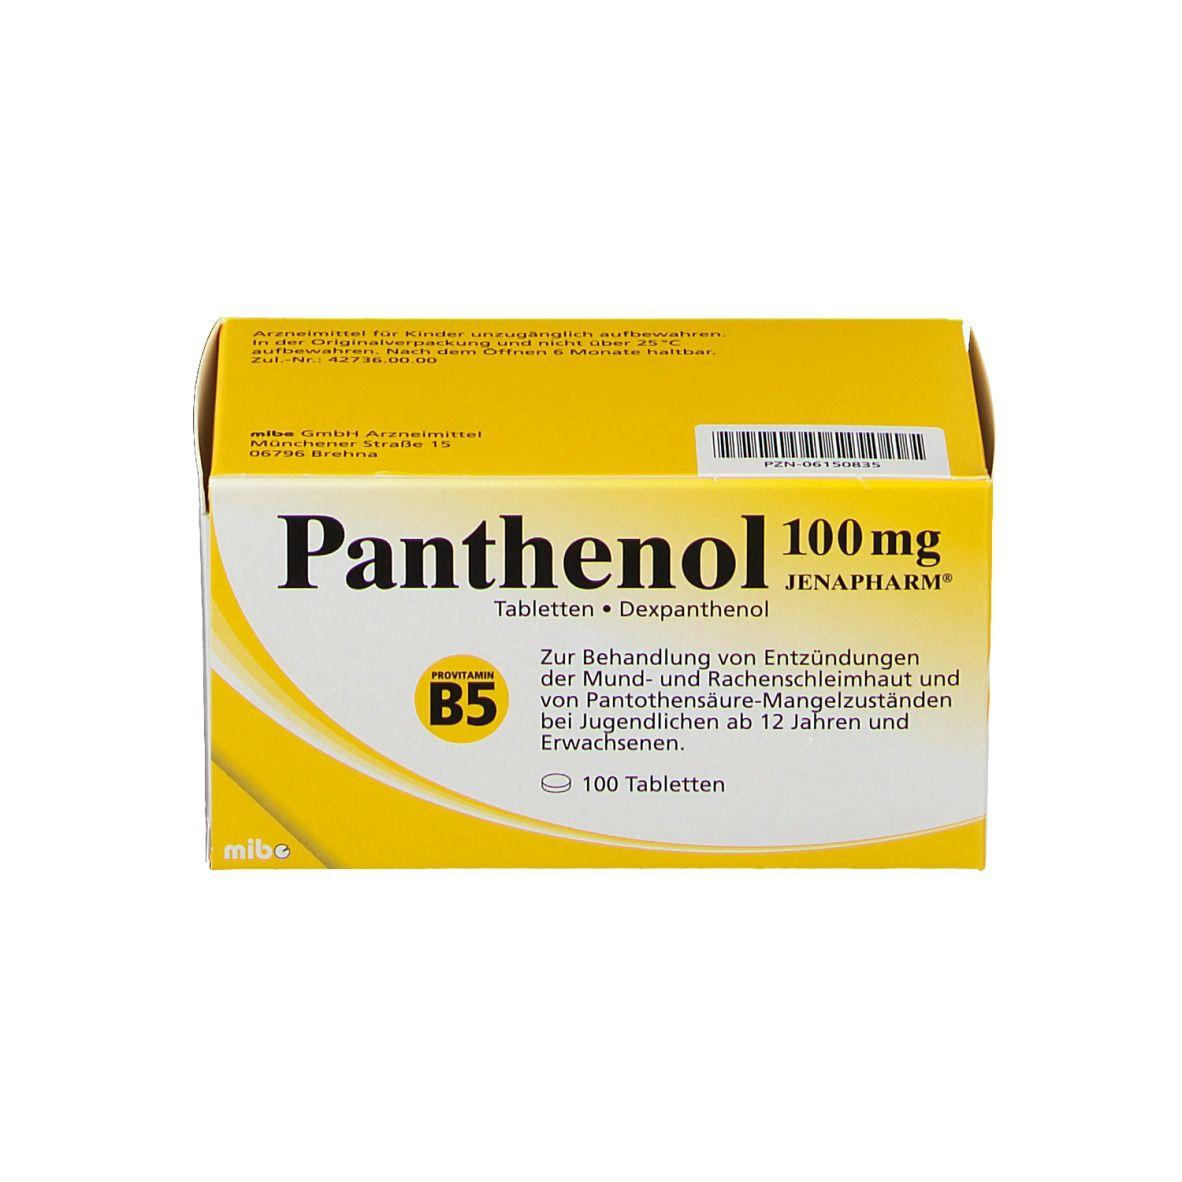 Panthenol 100 Mg Jenapharm Tabletten 100 St Shop Apotheke Com